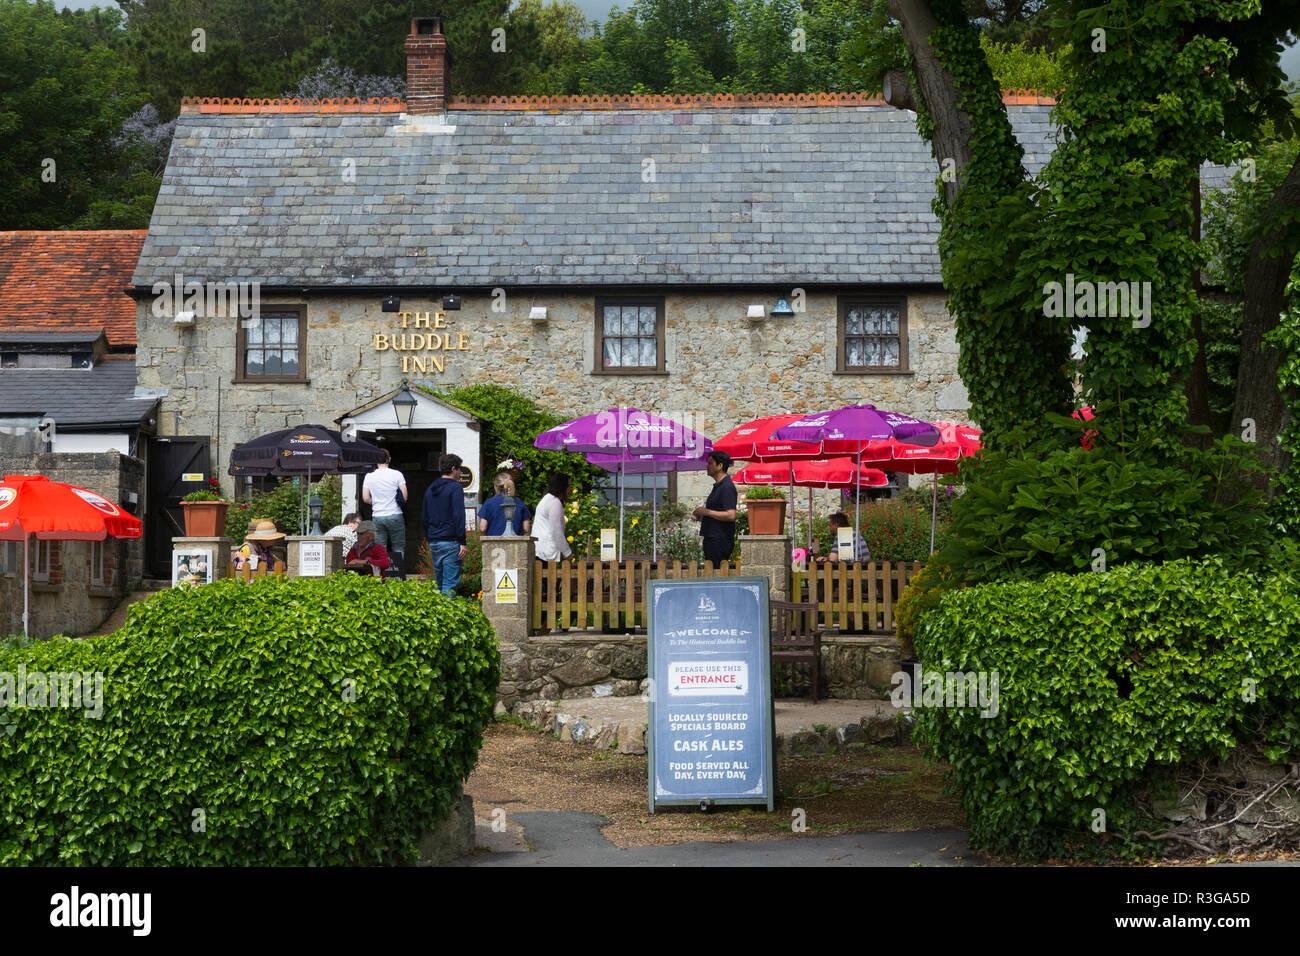 The Buddle Smuggler's Inn. St Catherine's Rd, Niton, Ventnor PO38 2NE. Isle of Wight. UK. (98) - Stock Image